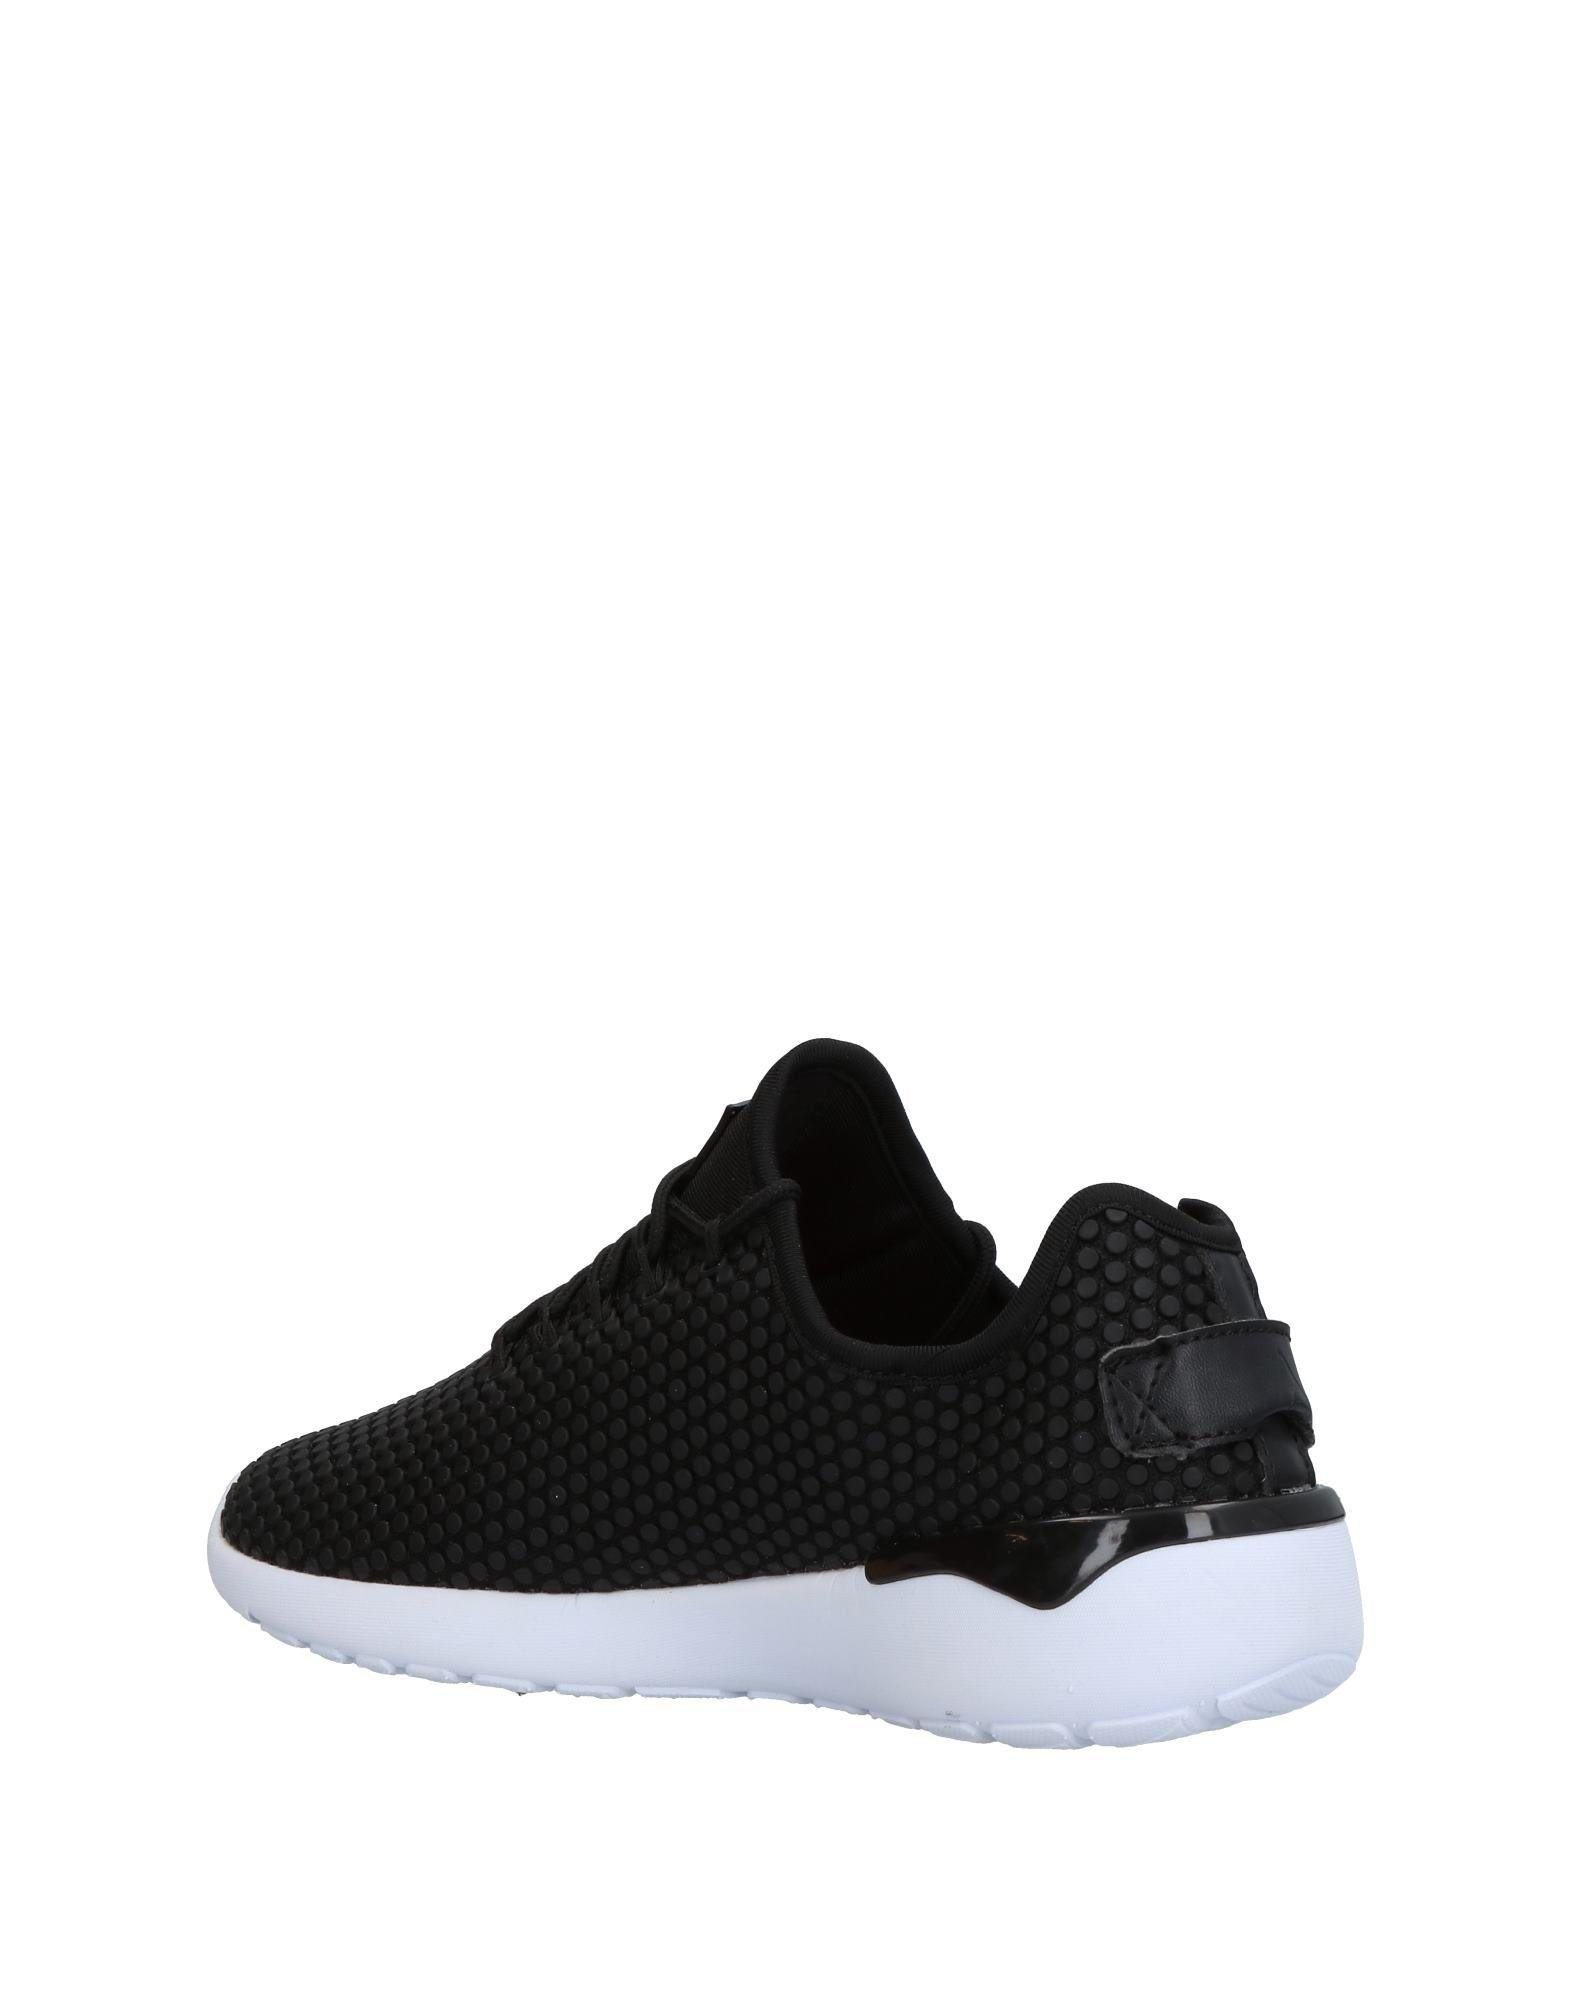 Sneakers & Deportivas ASFVLT Sneakers de color Negro